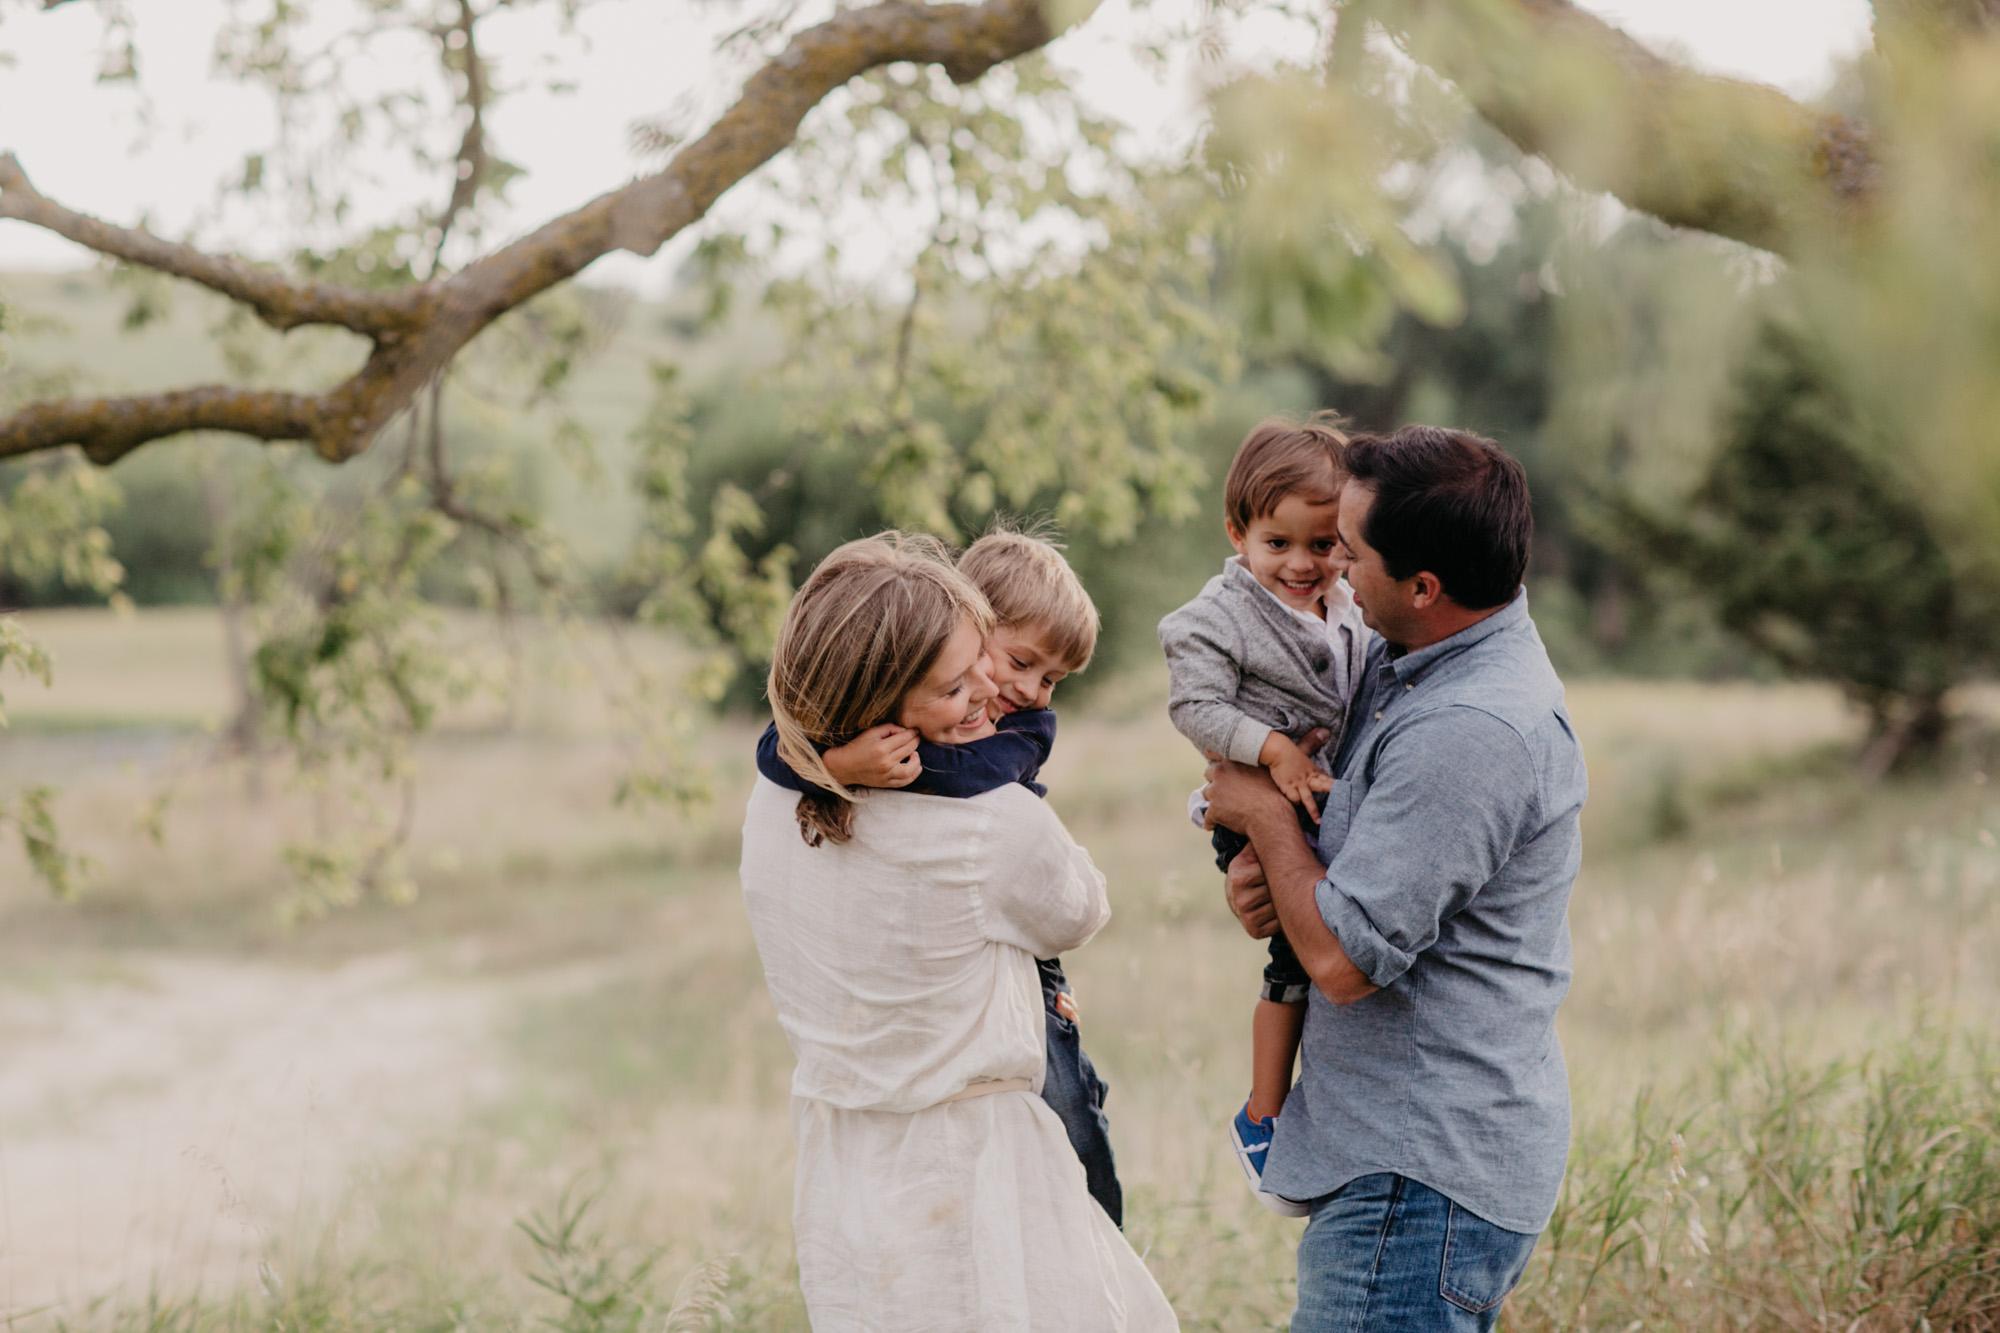 omaha-family-photographer-burks-8.jpg